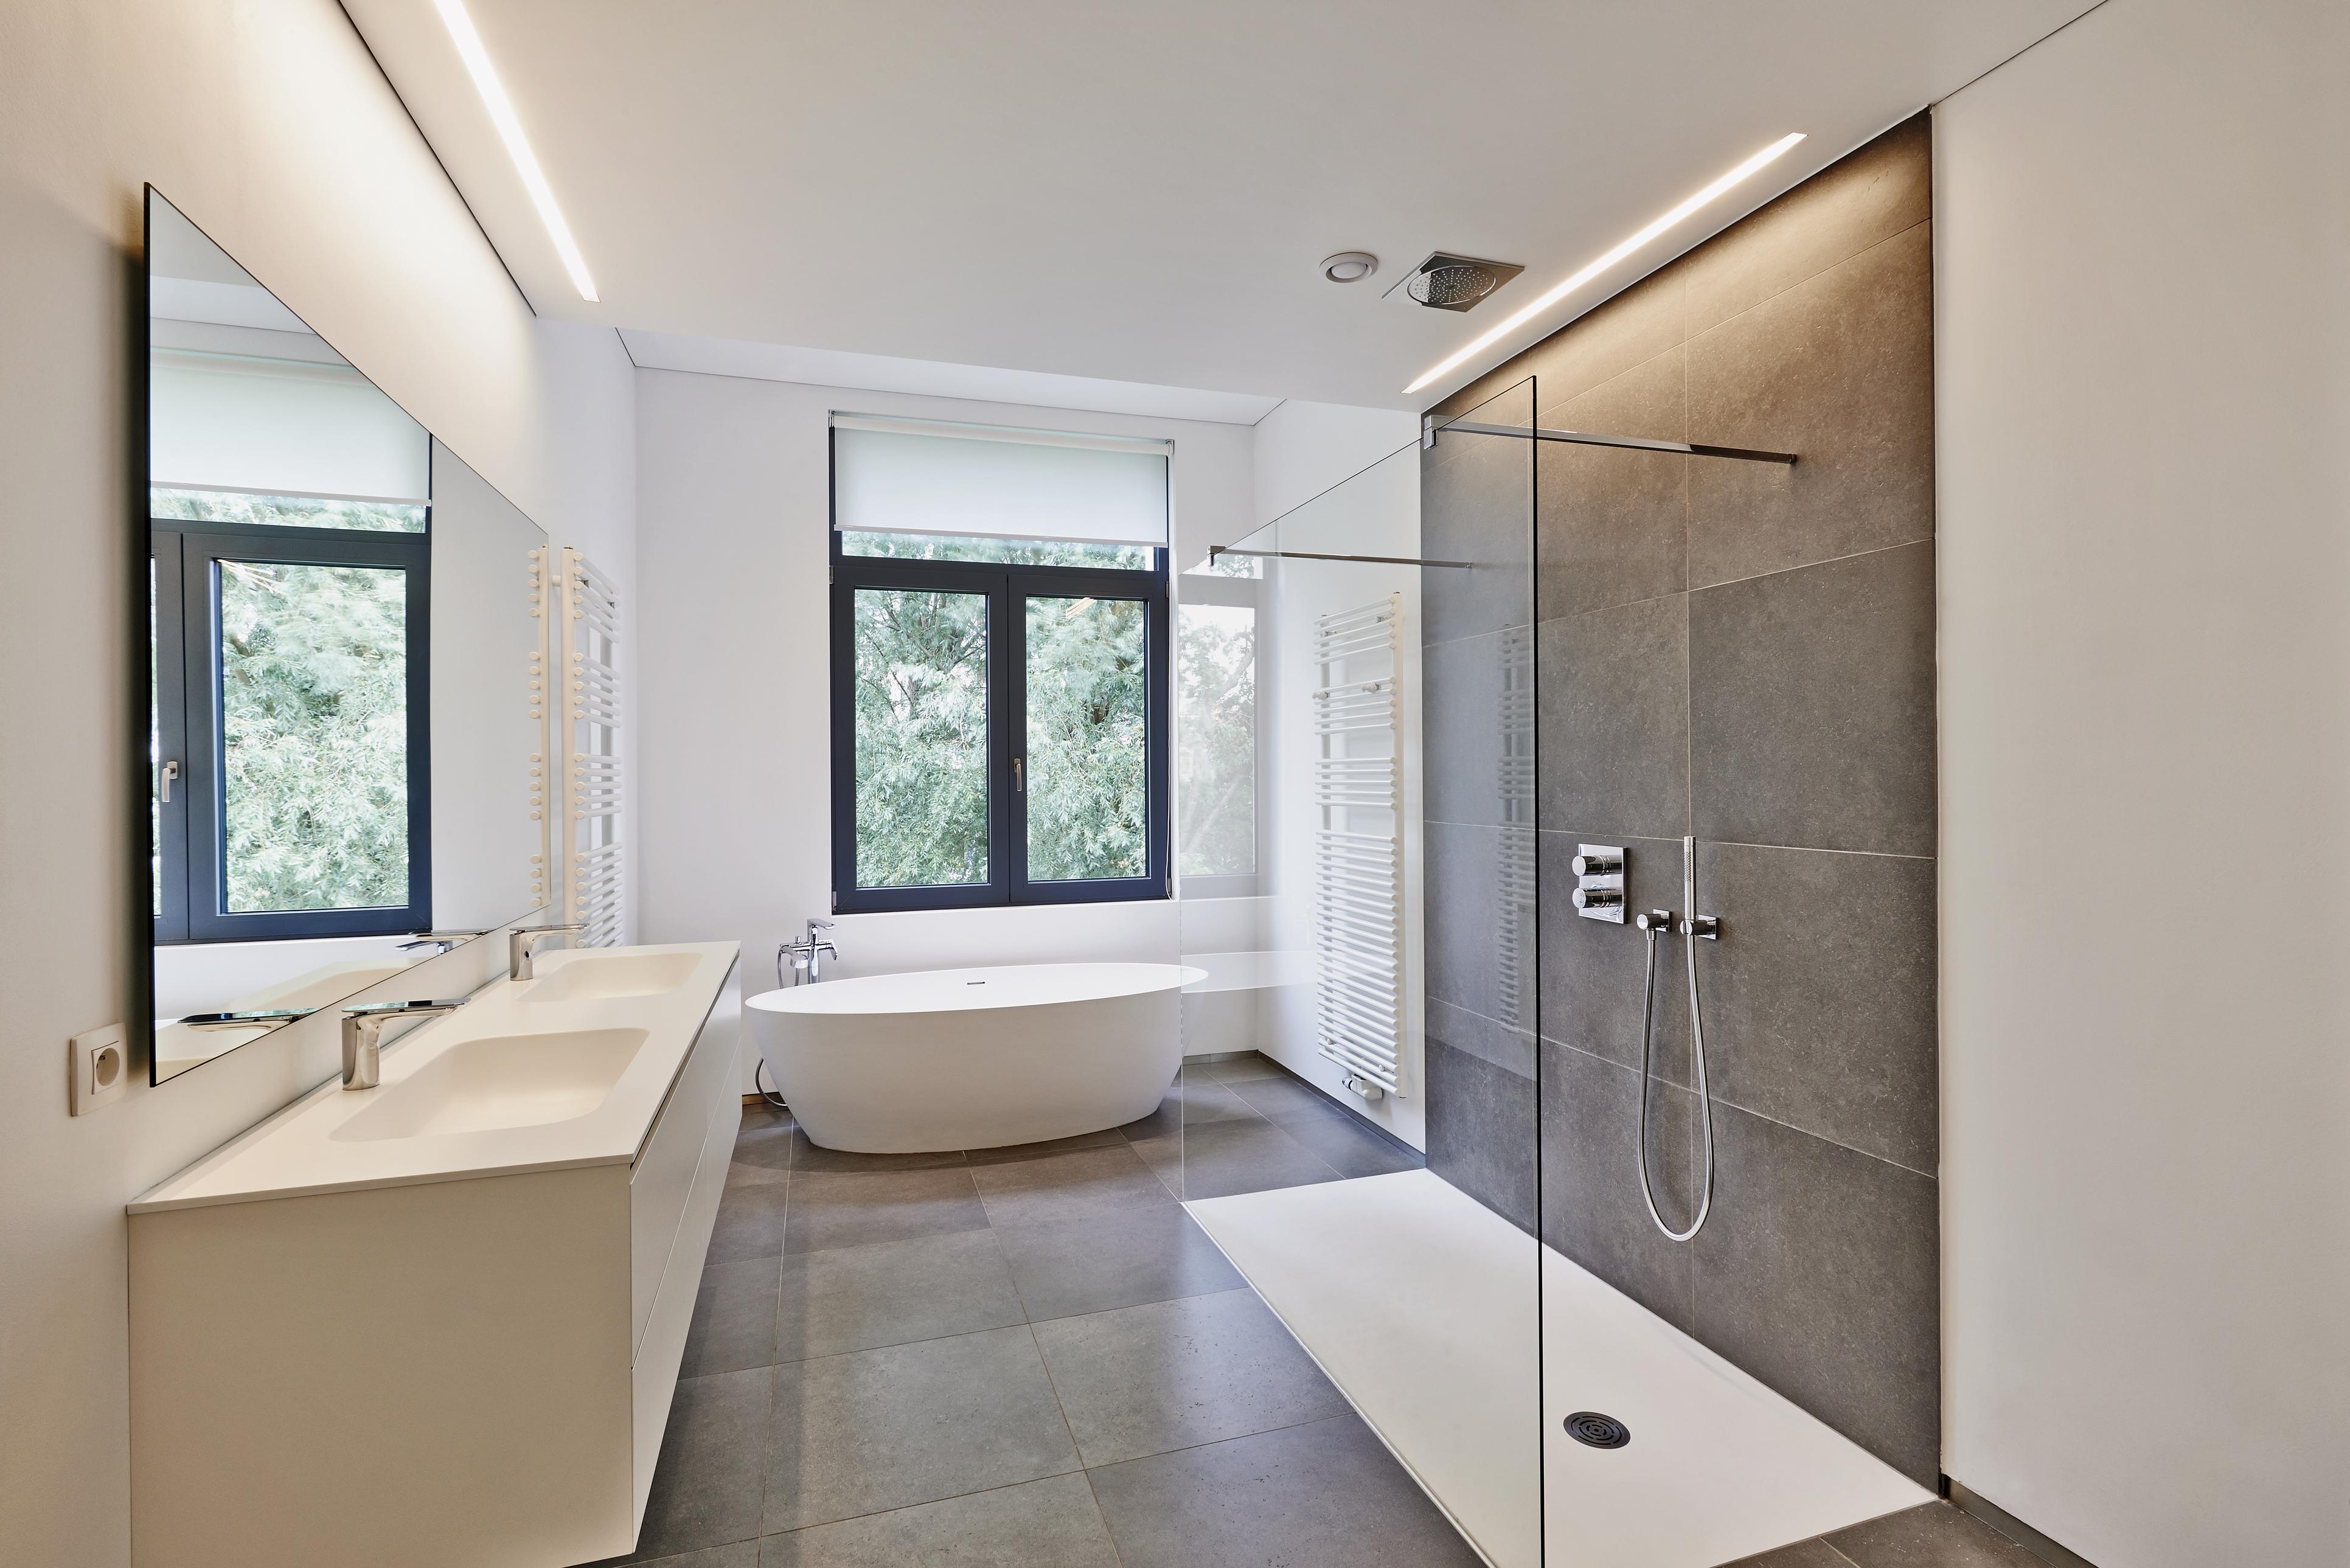 Ideas for Creating a Stylish Accessible Bathroom